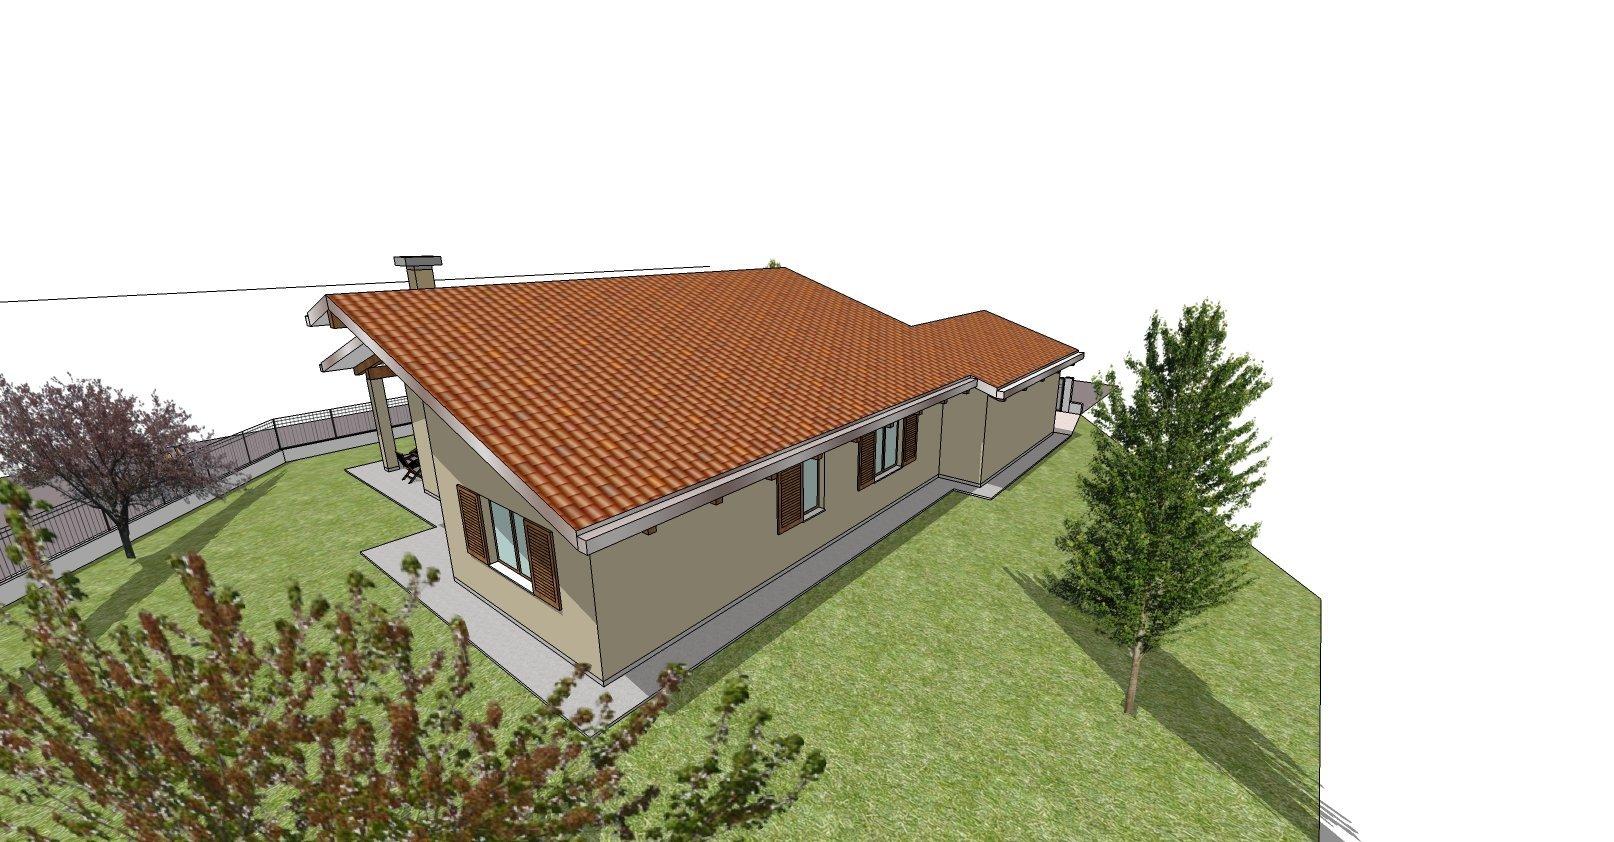 disegno bozza casa - area giardino